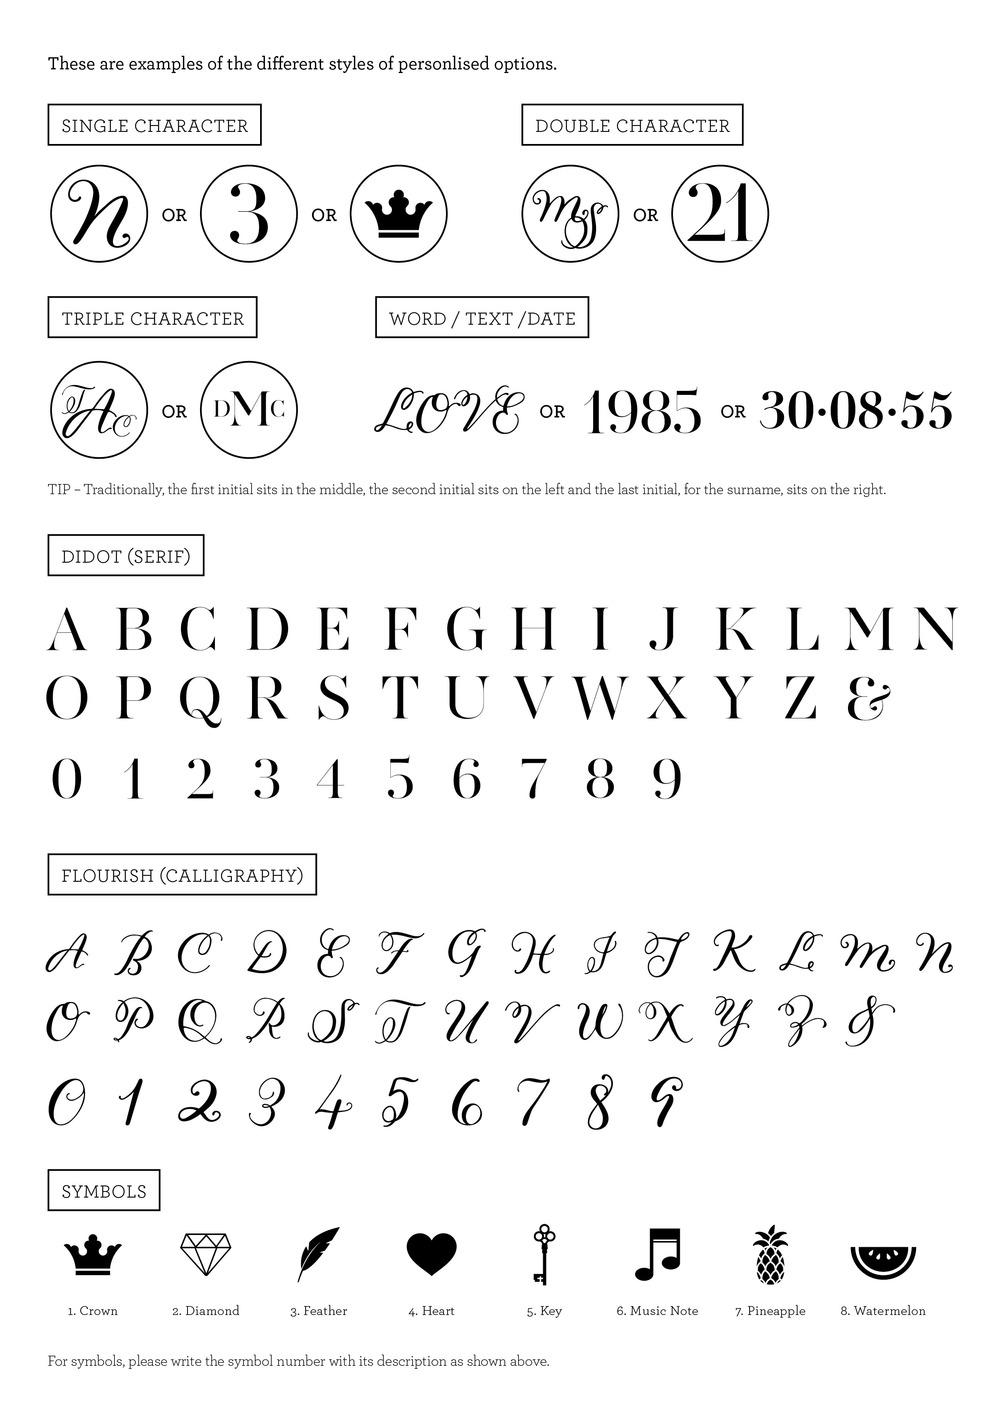 Monogram Order Form.jpg